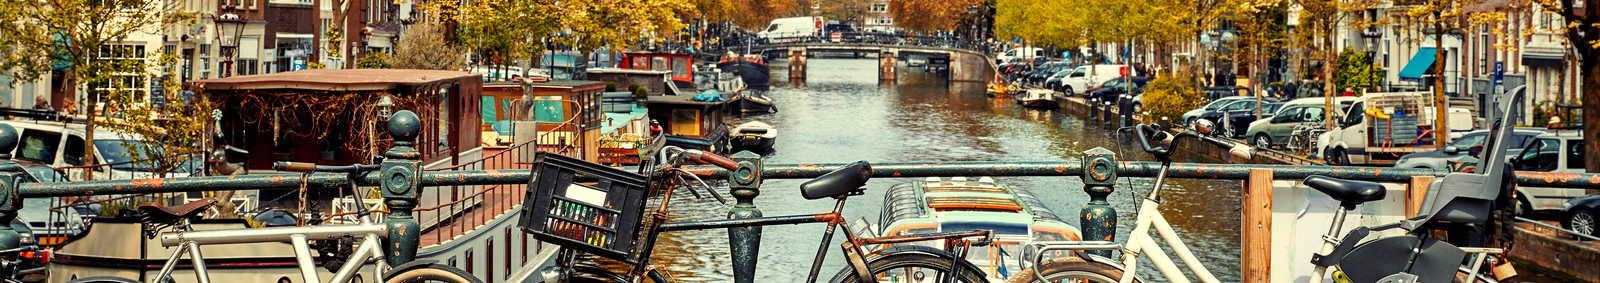 amsterdam_bikes_on_bridge